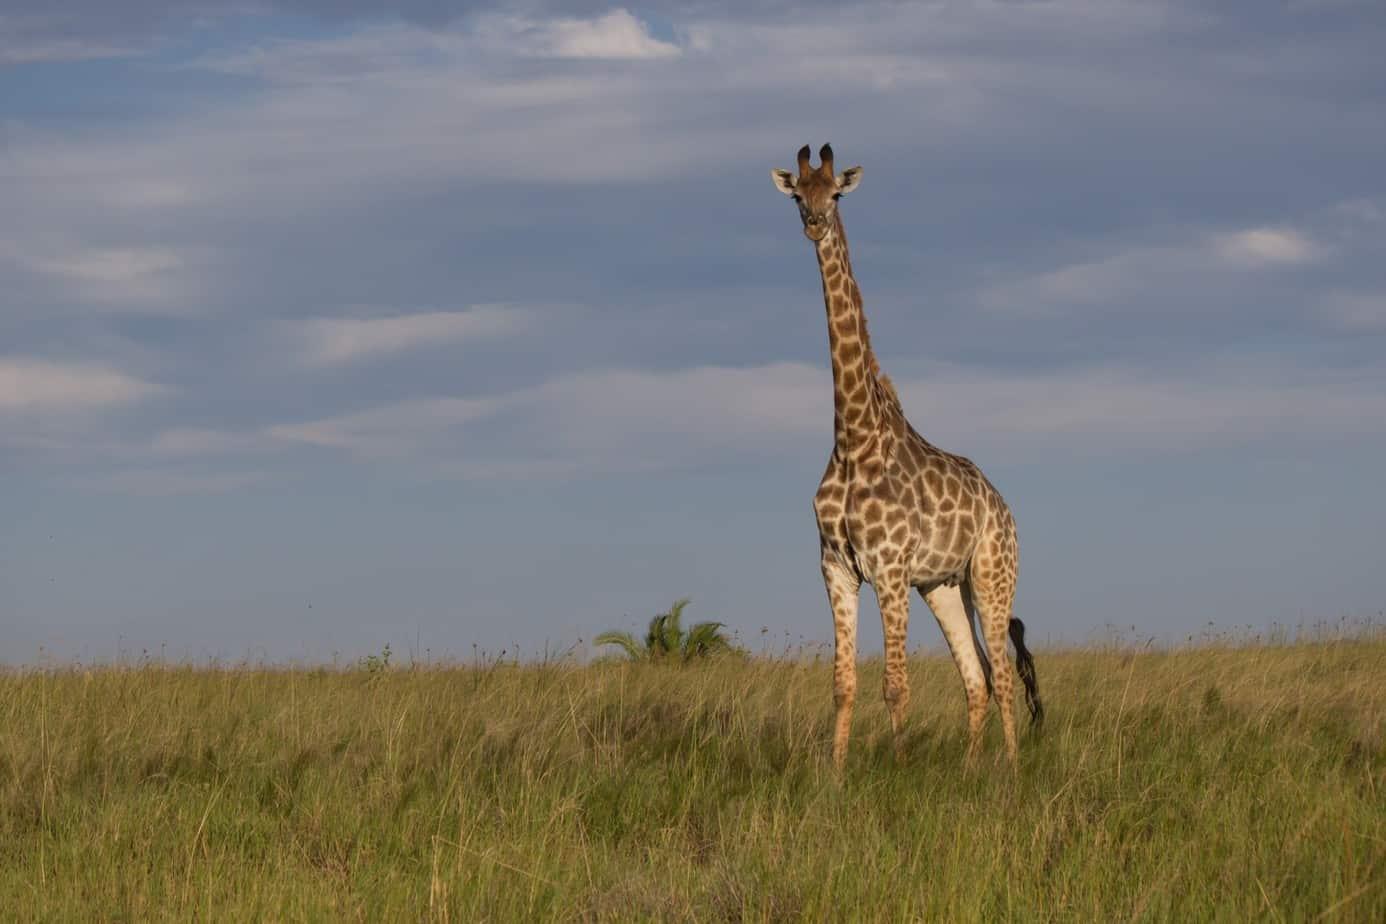 Southern Giraffe @ Western Shores – iSimangaliso Wetland Park. Photo: Håvard Rosenlund